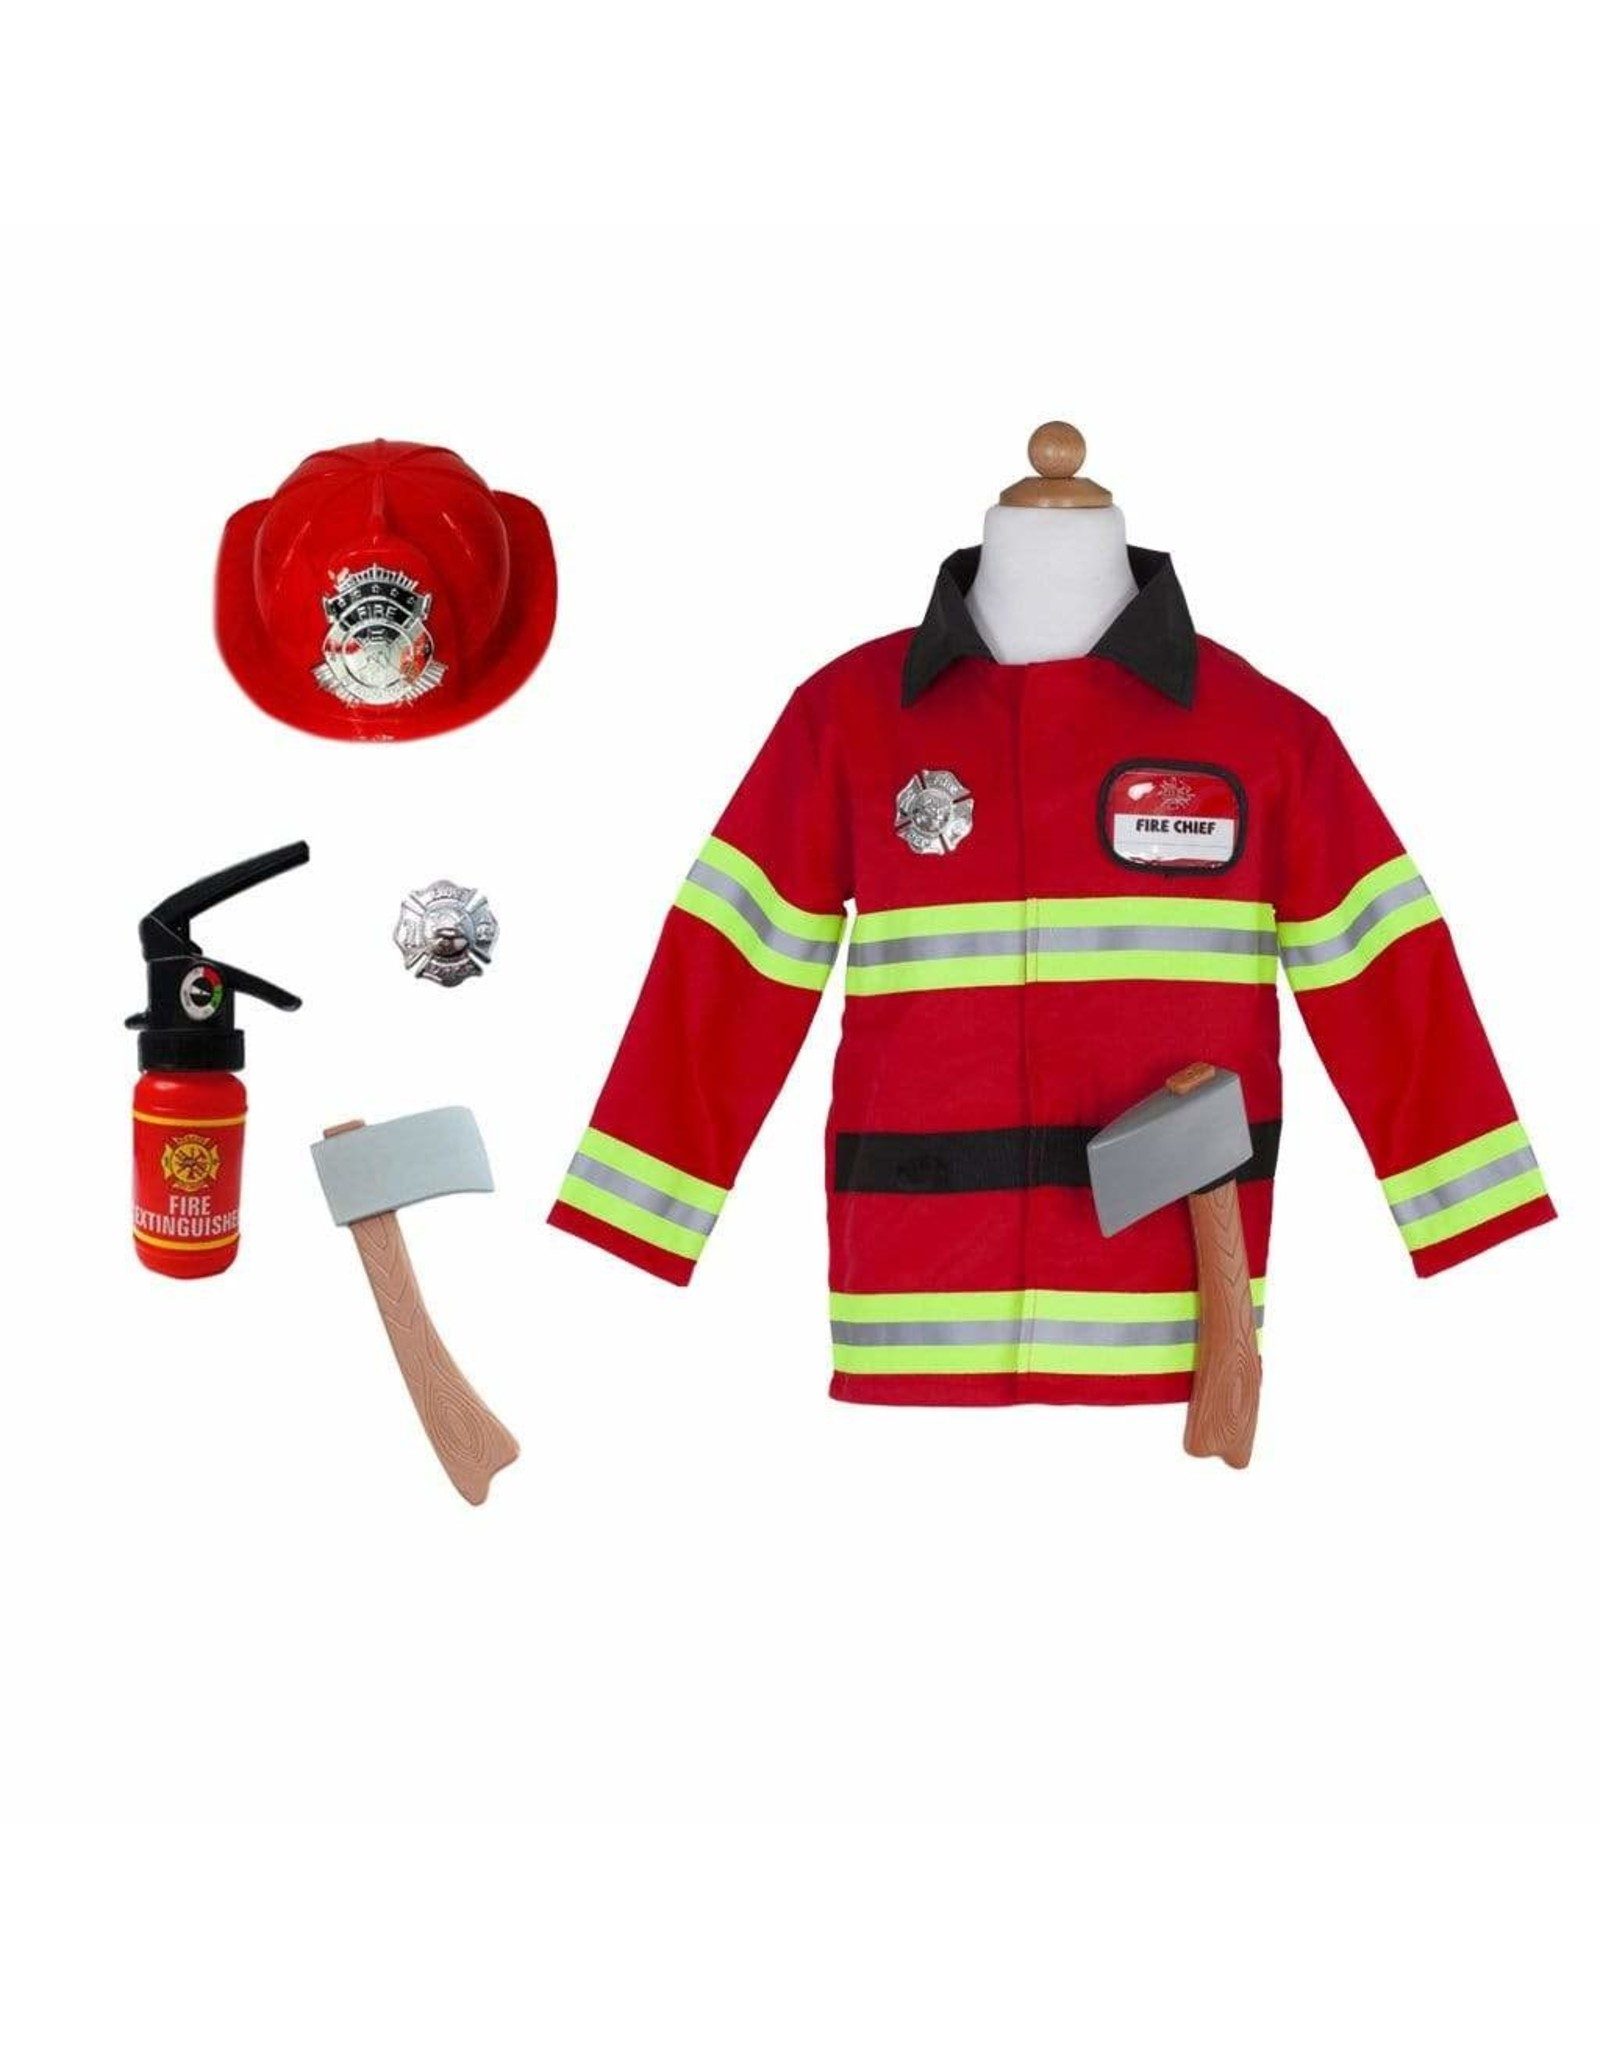 Great Pretenders Firefighter W/Accessories, Size 5-6